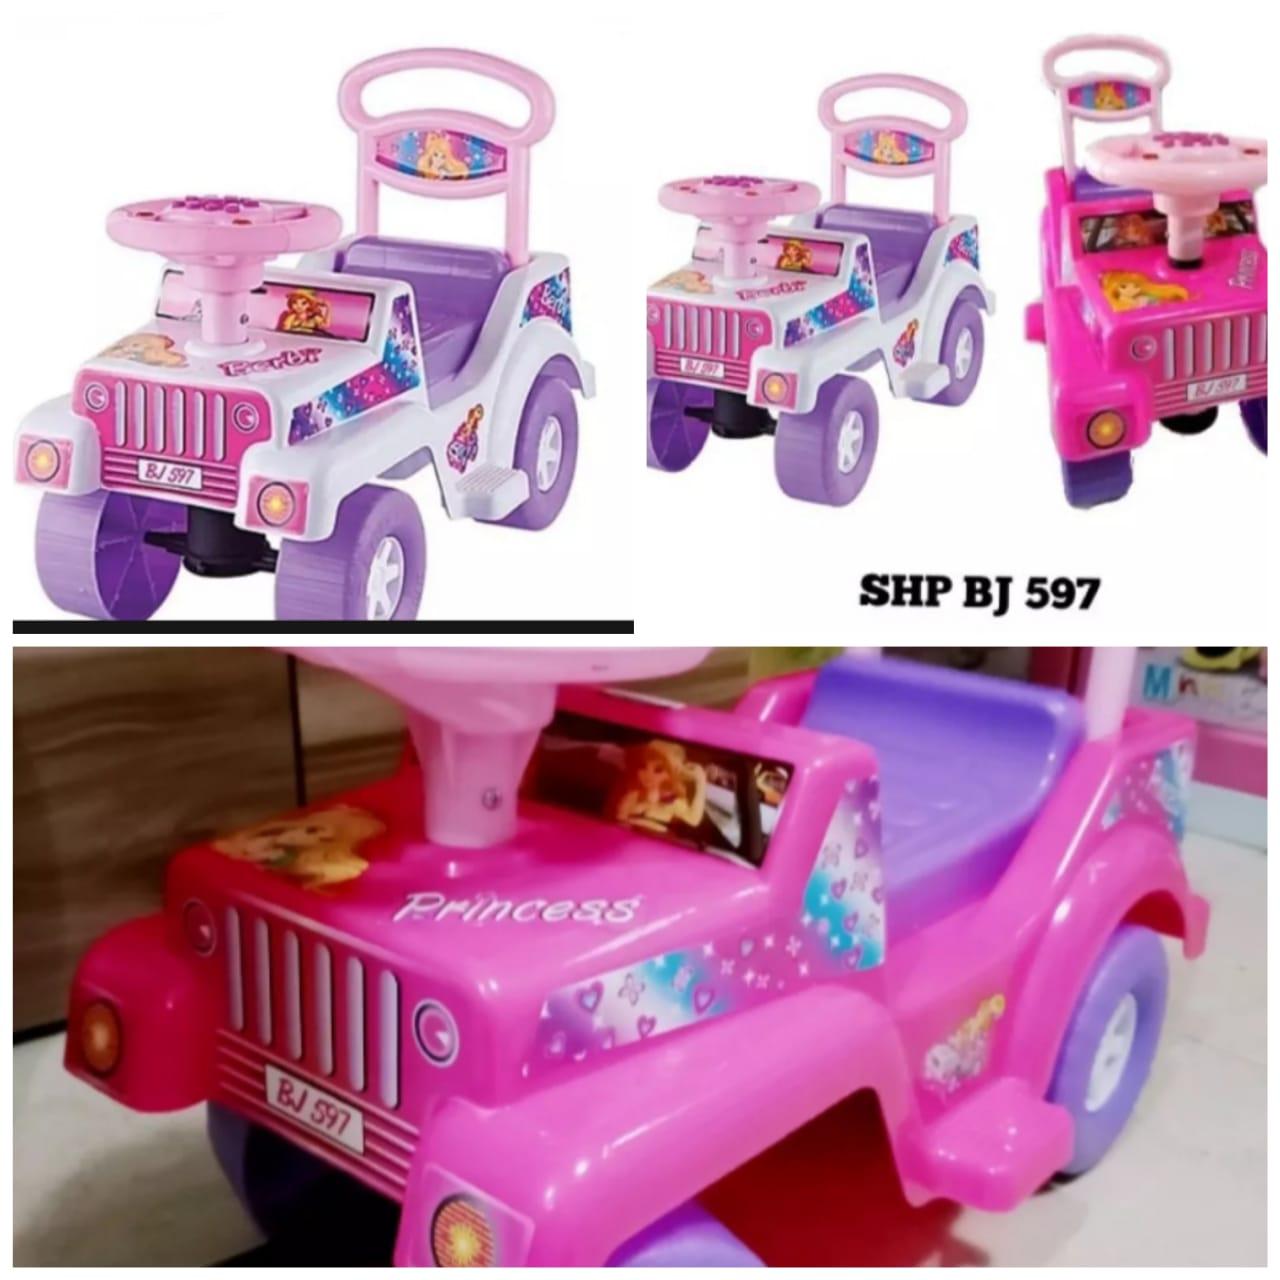 Mainan Mobil Mobilan Anak Perempuan Shp Princess Lazada Indonesia